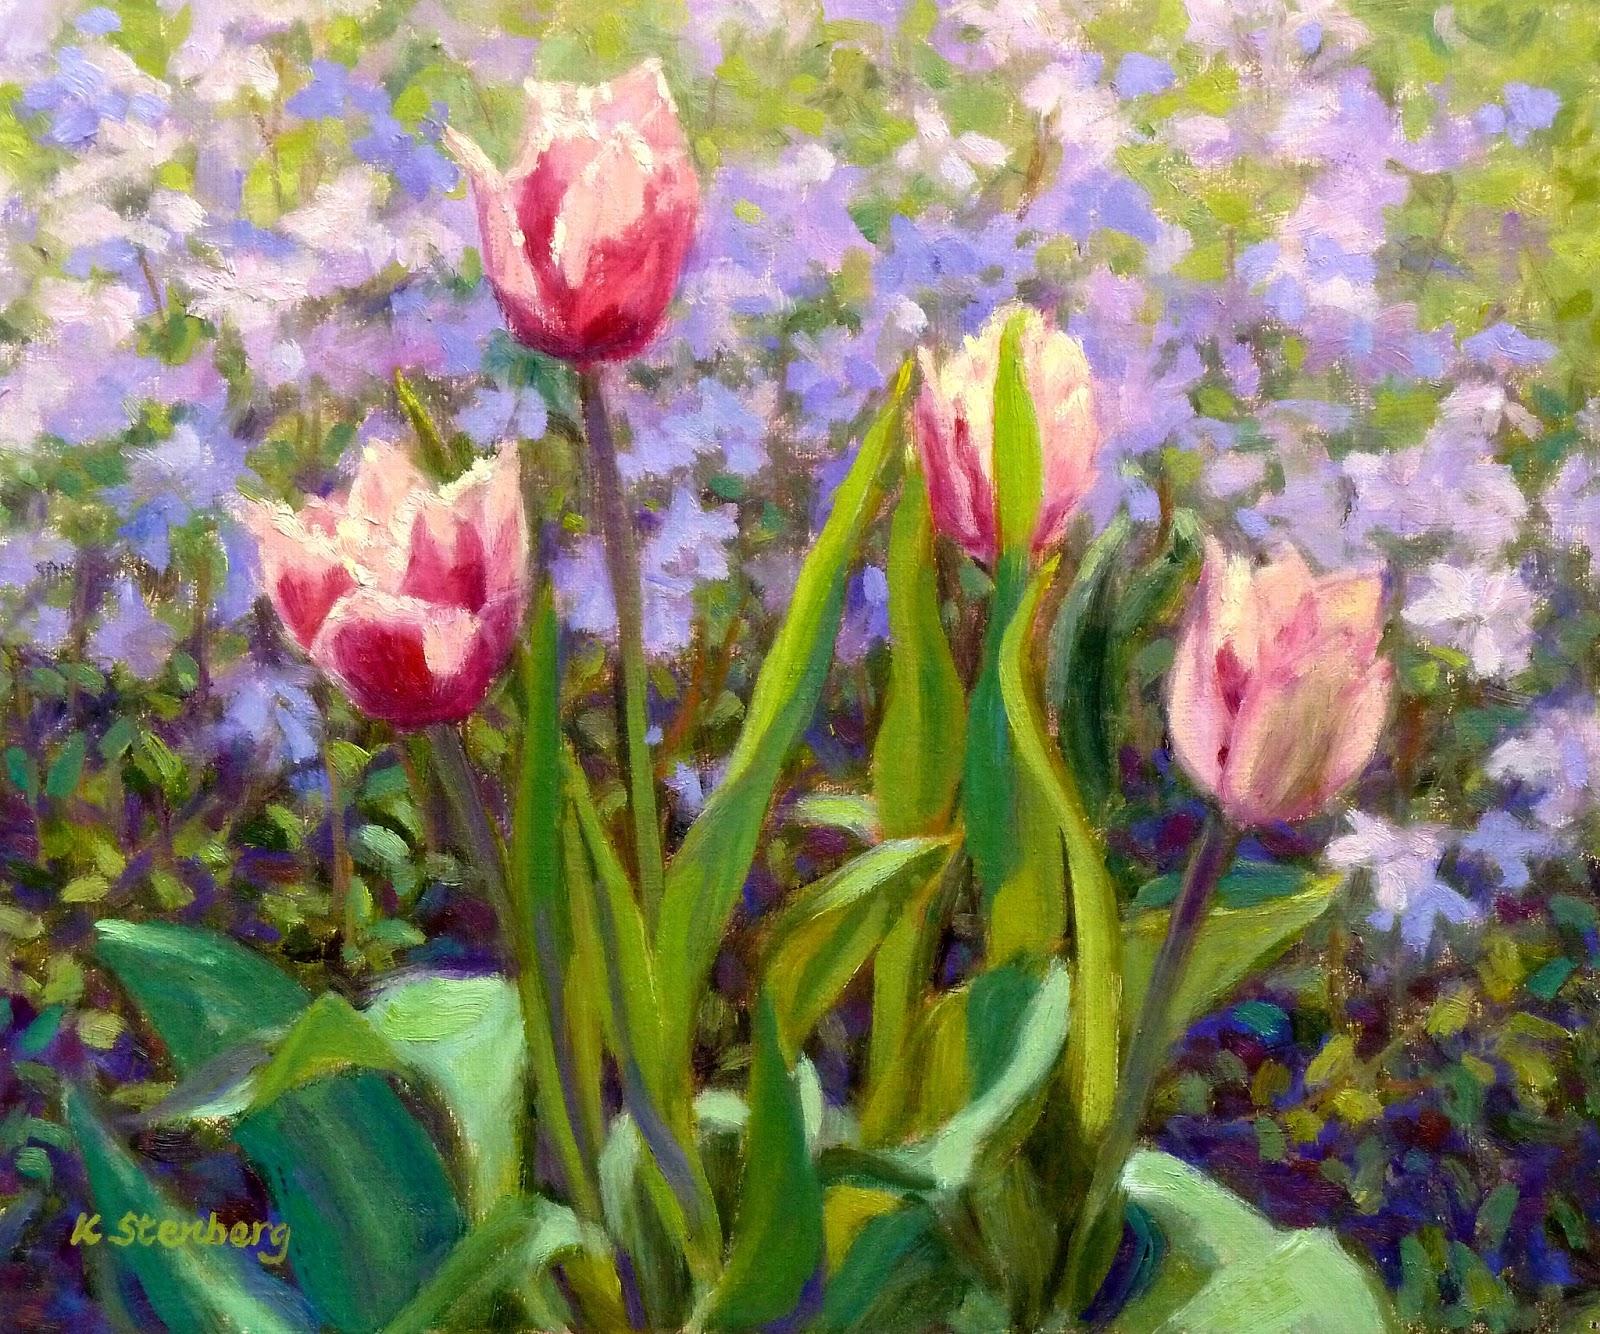 just tulips spring garden - photo #27